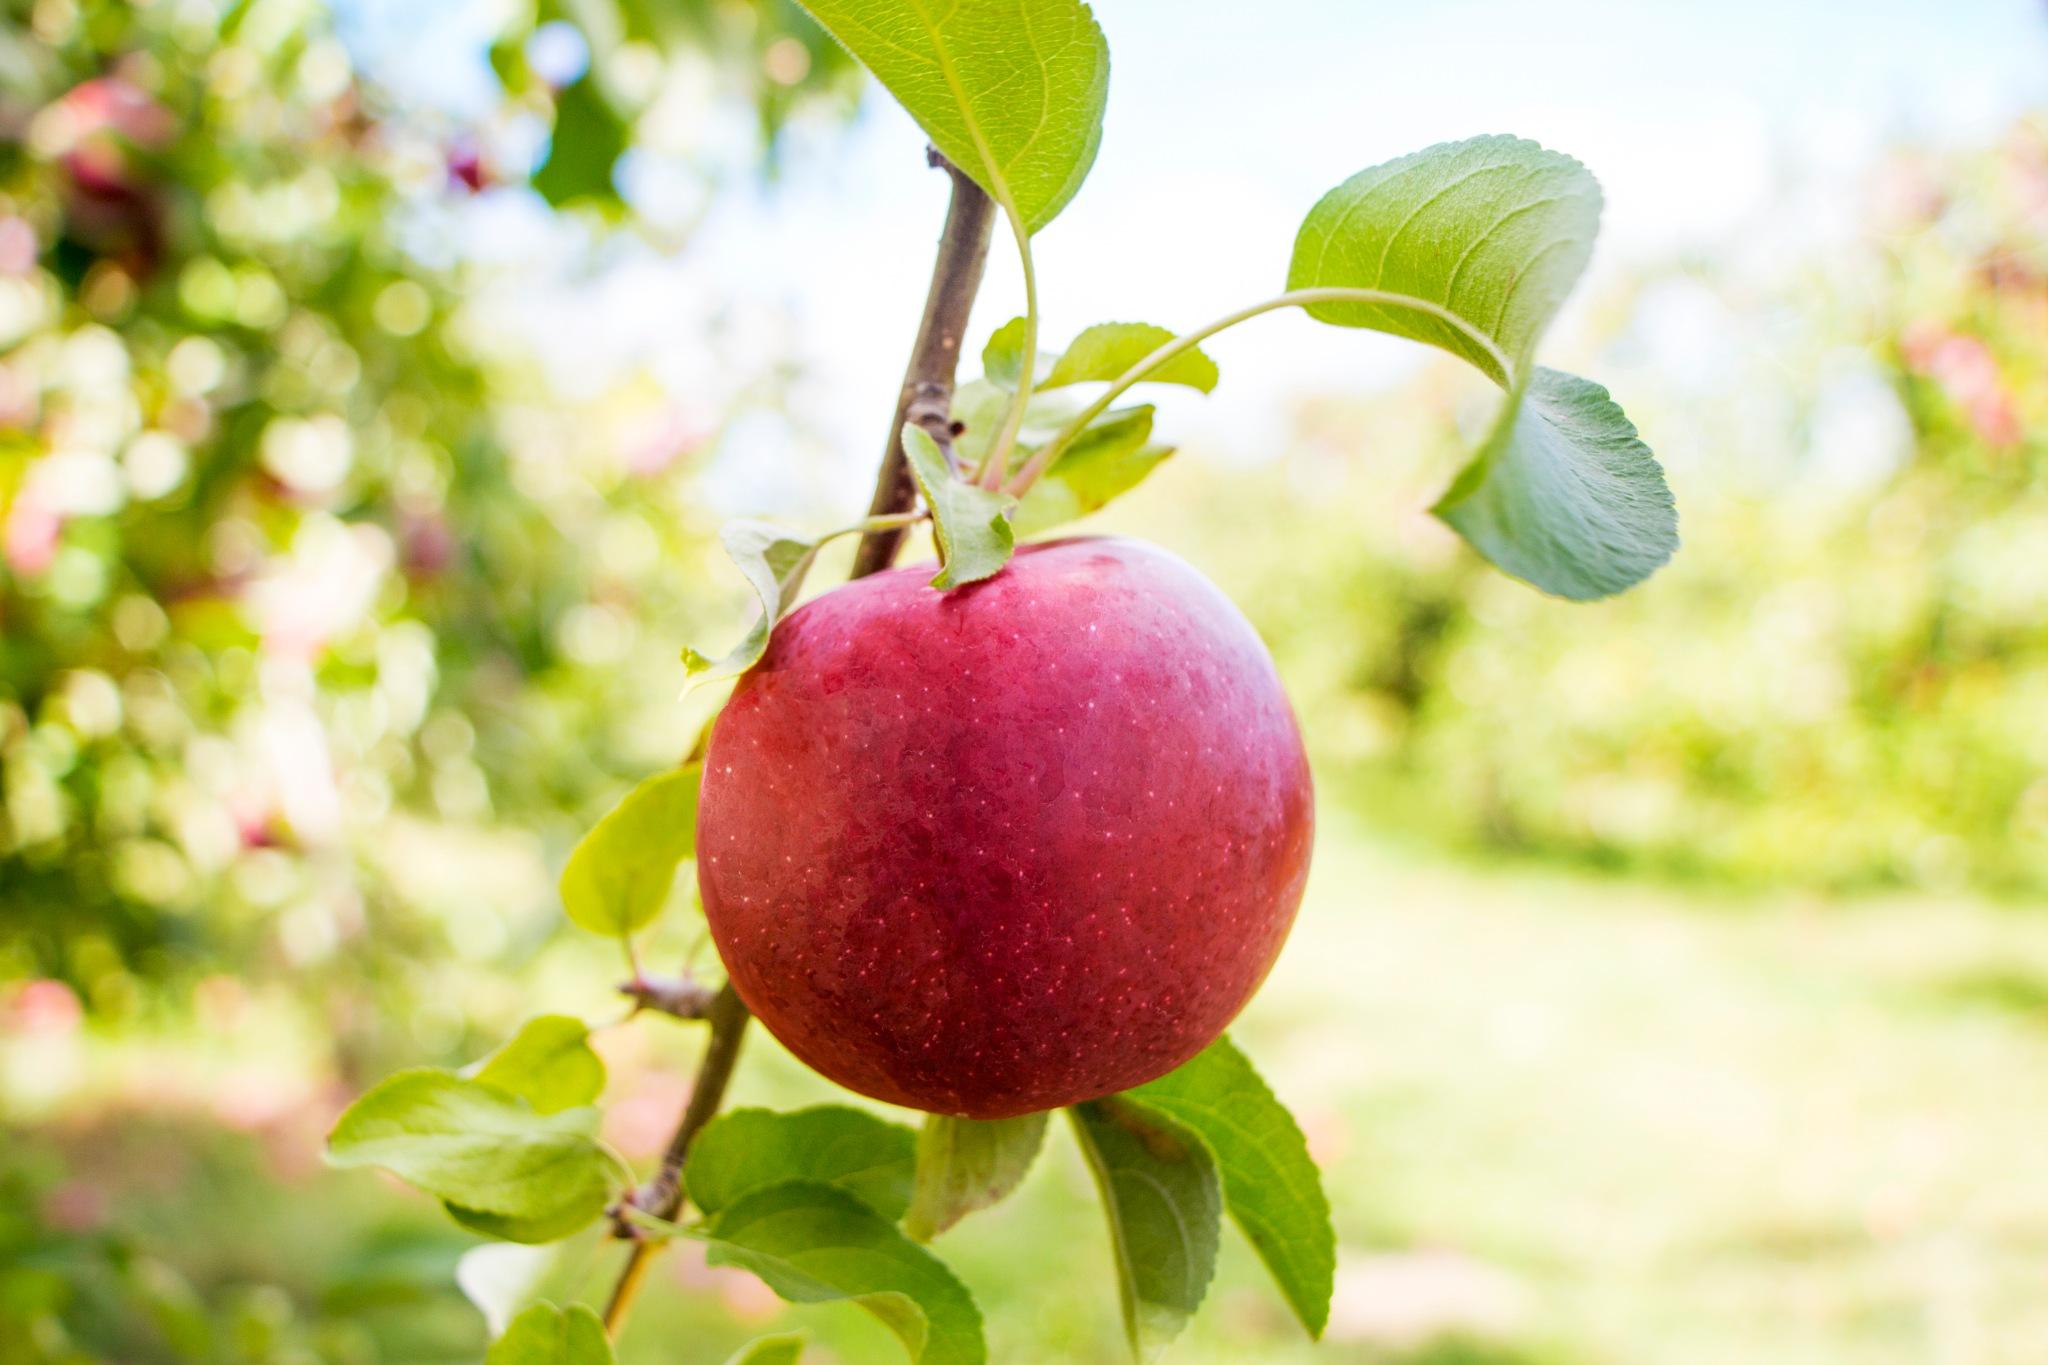 Delighted Apple by Amanda O'Halloran